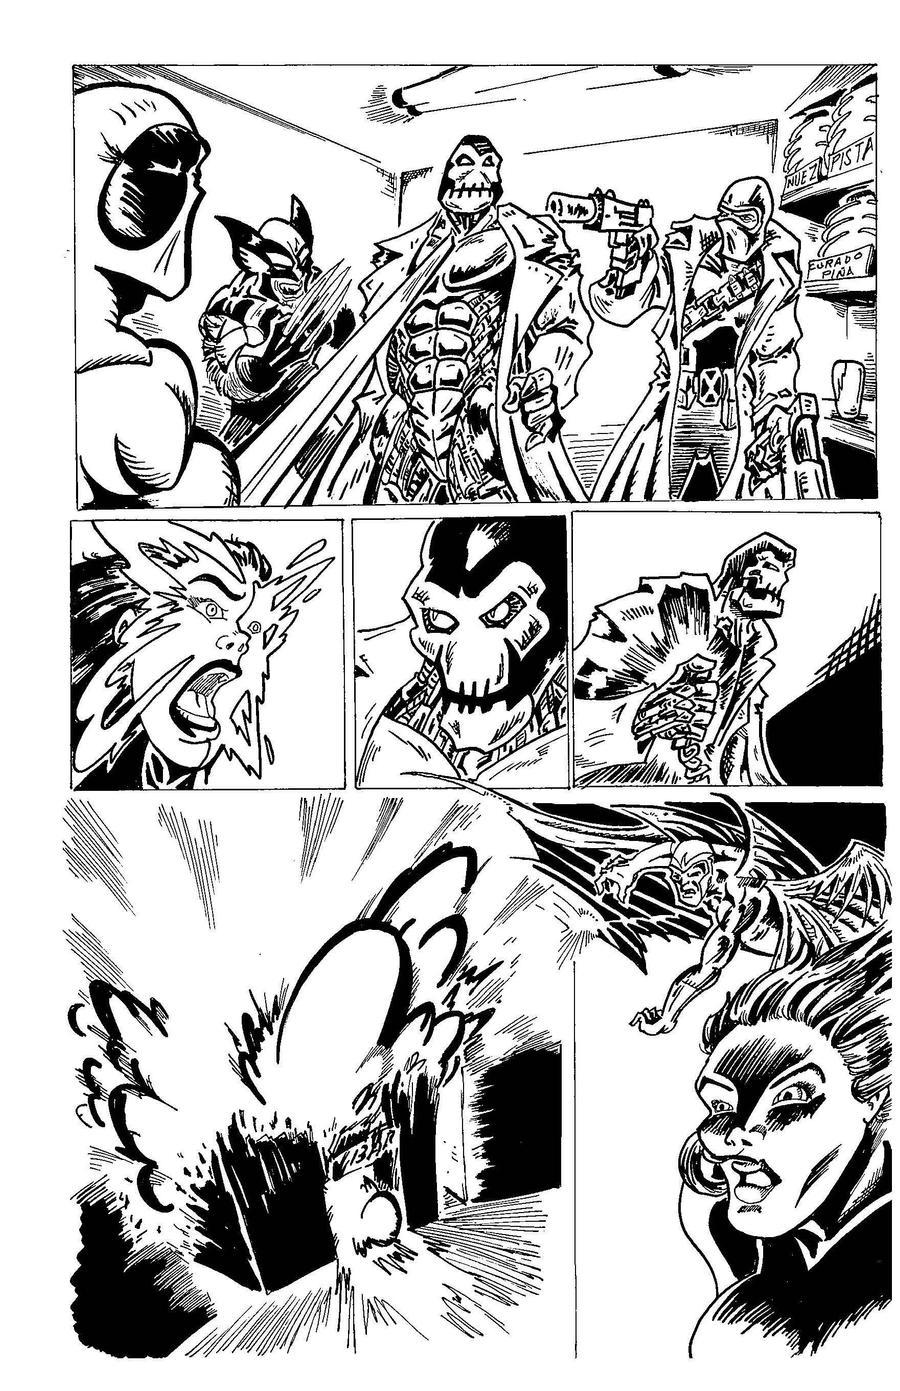 pagina X-Force para FestoCom by mrpulp-presenta